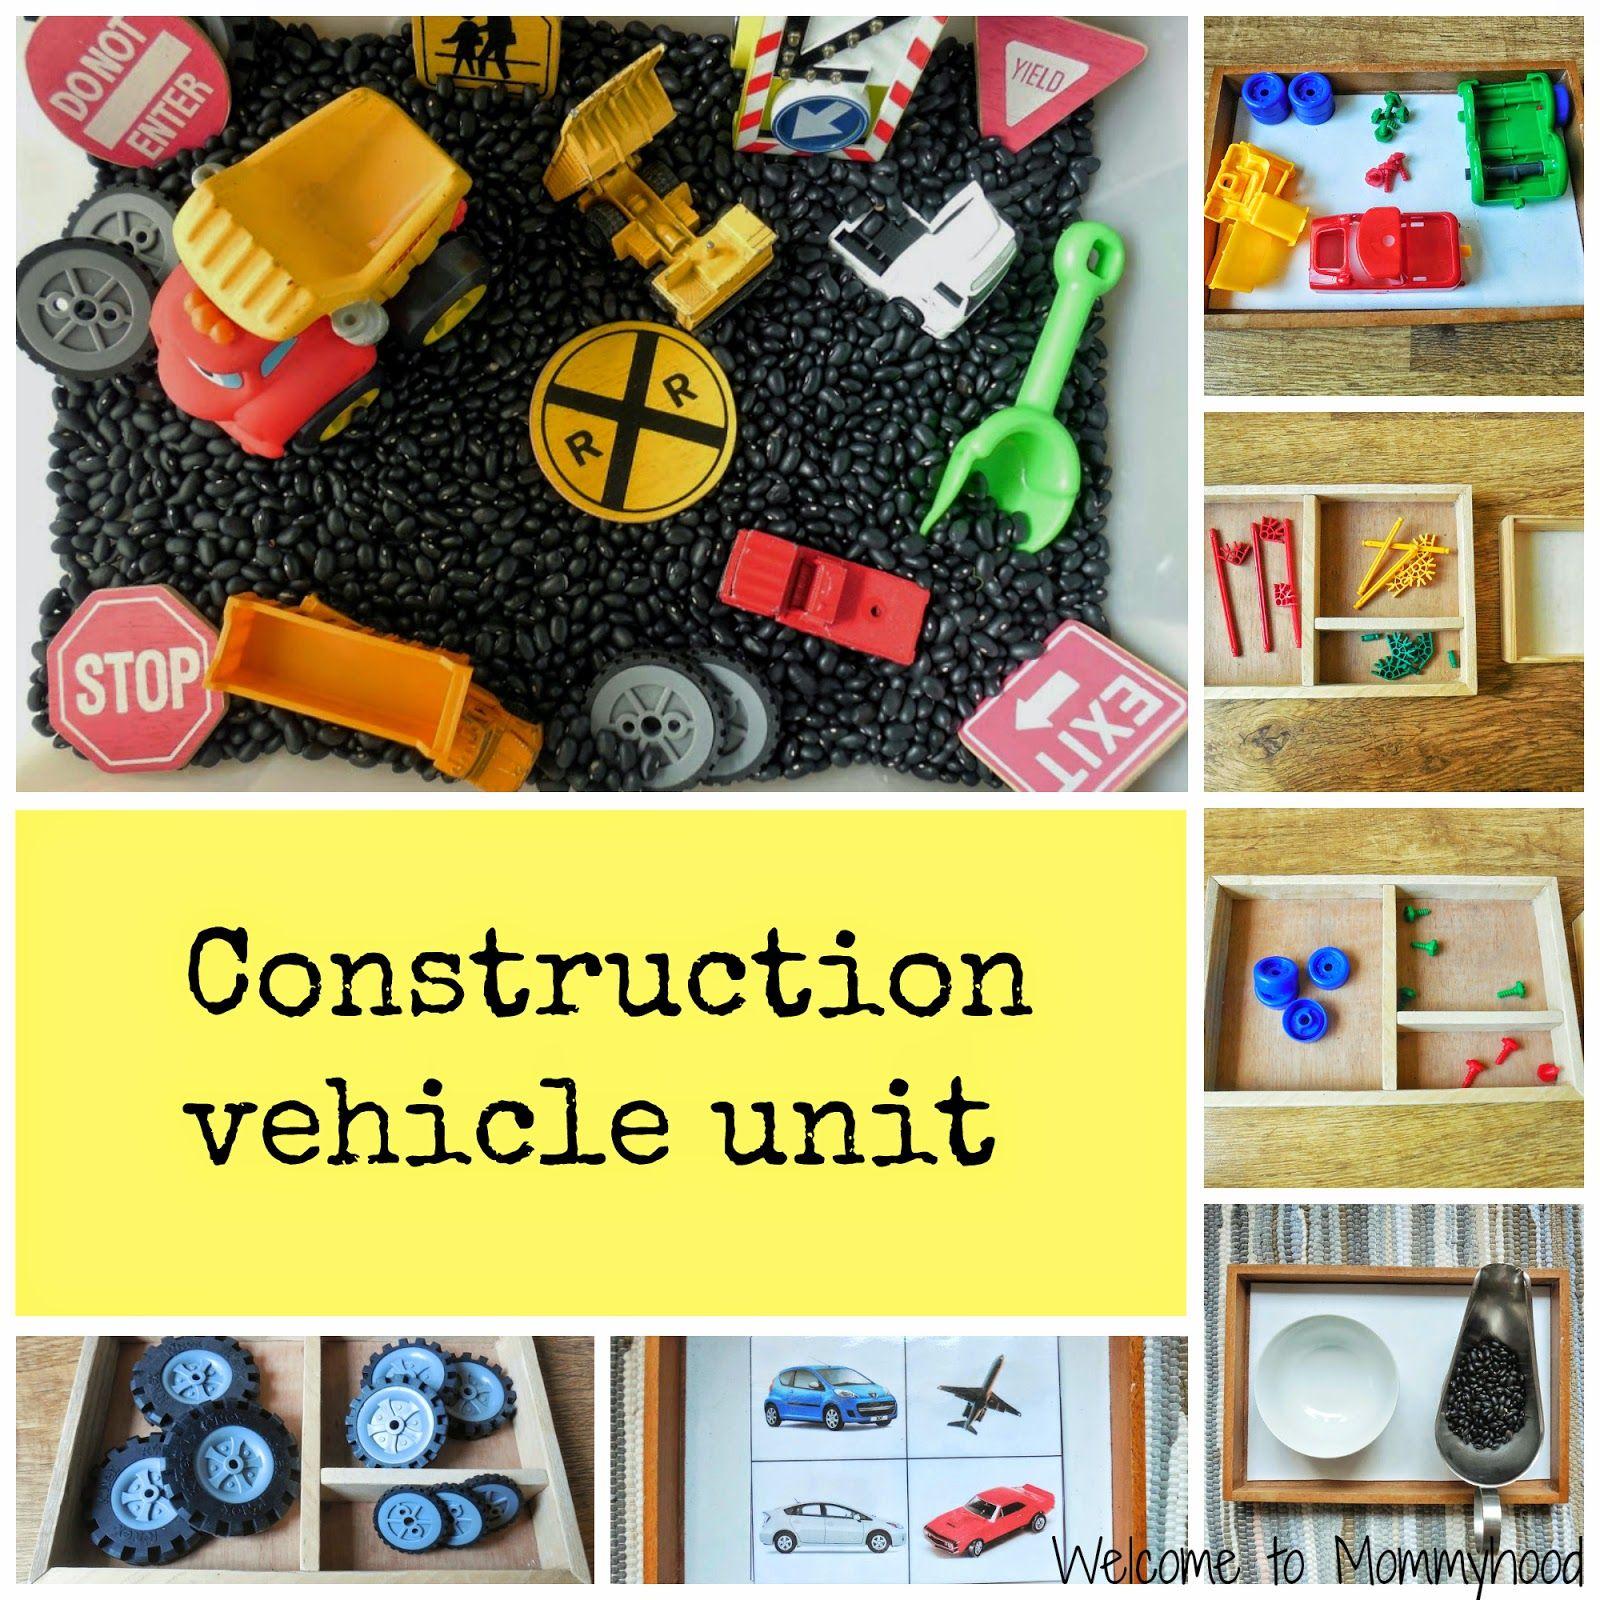 Construction Activities For Kids Montessori Inspired